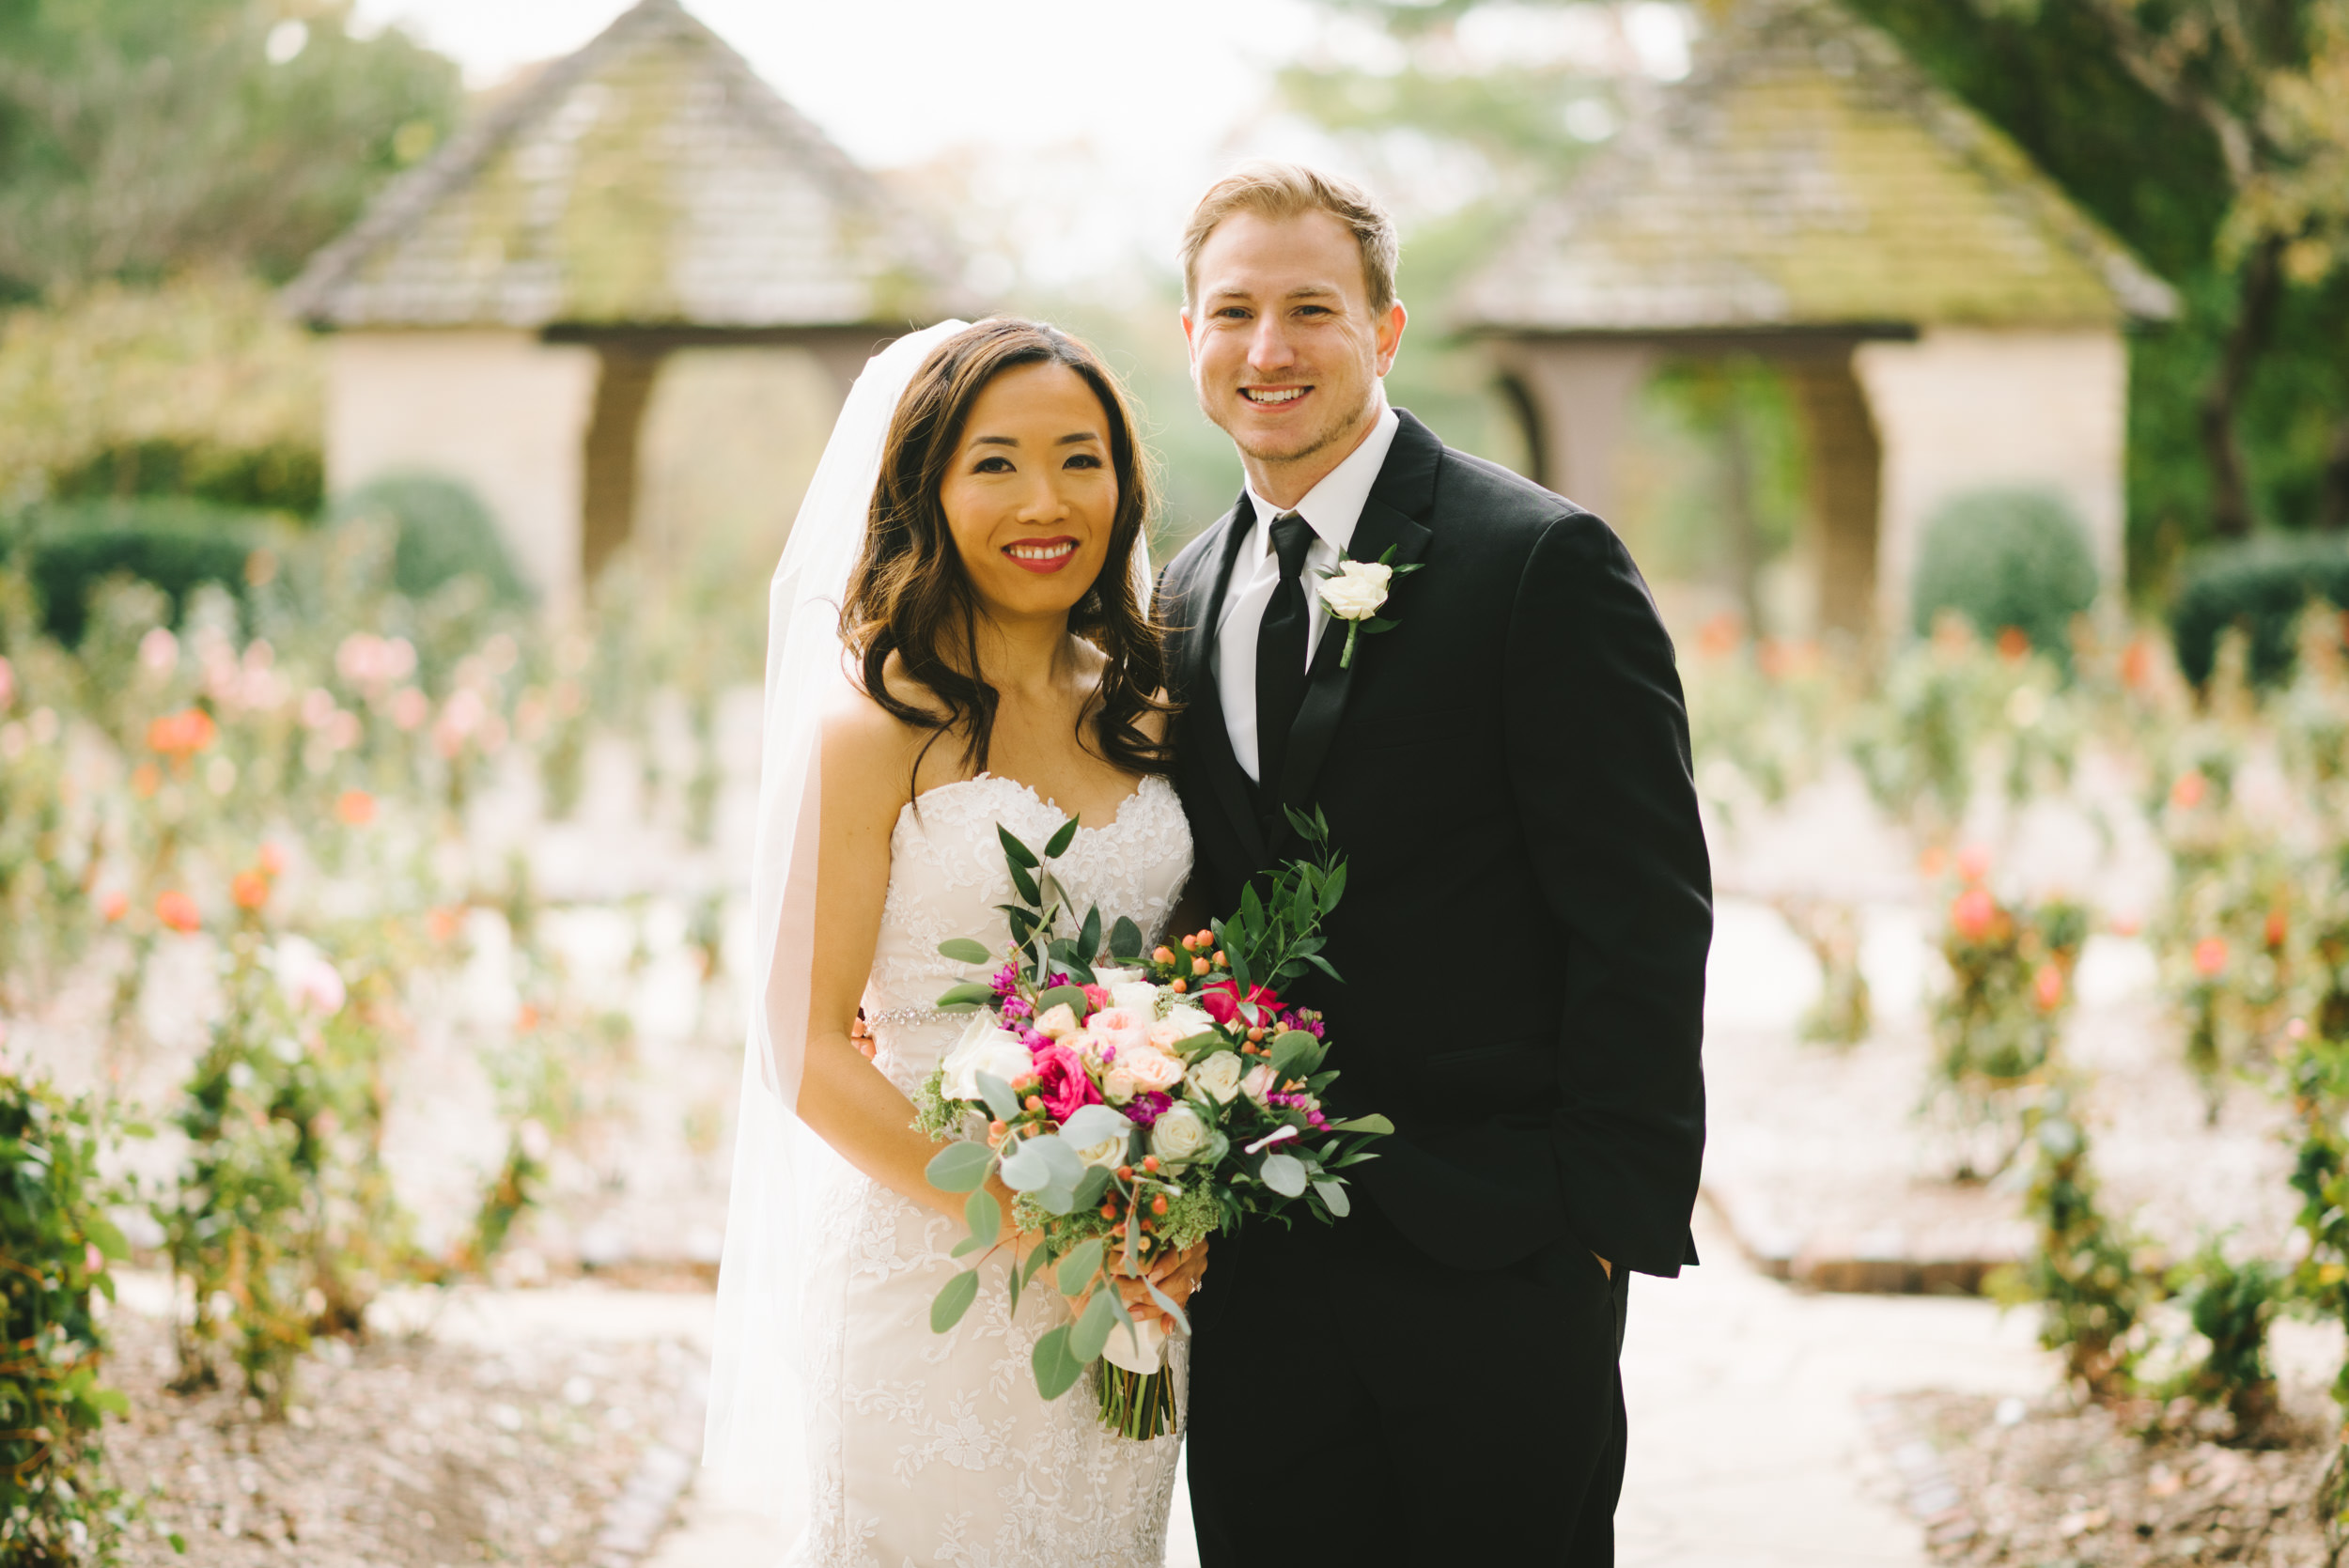 20171029_Wedding-Kristin-Garrett-288.jpg